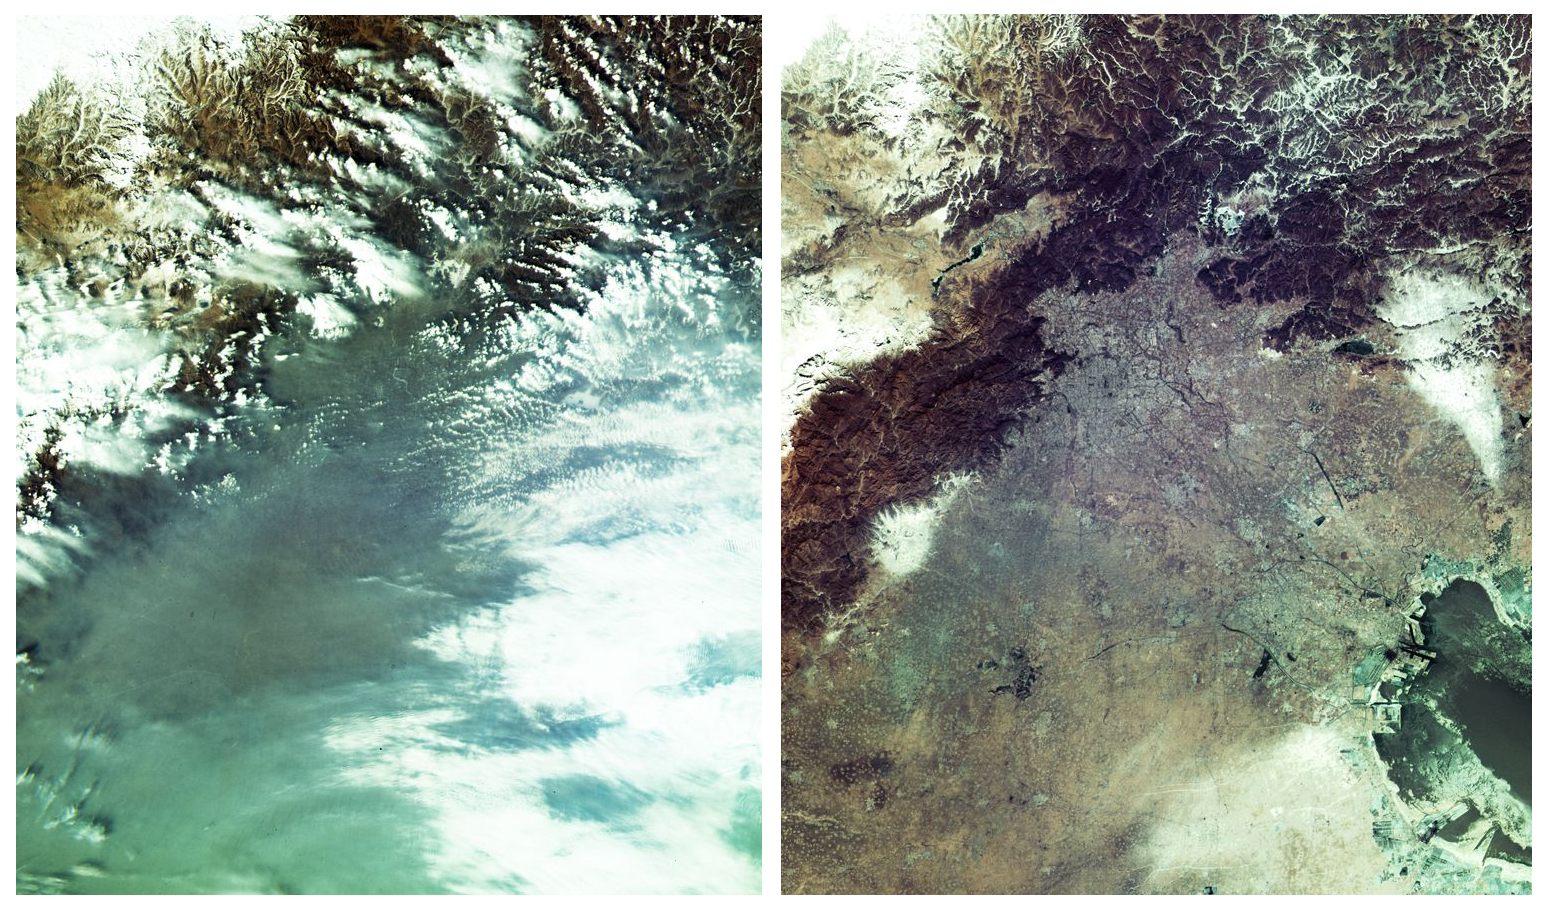 Gaofen-4 - Pékin - Beijing - Smog- Observation de la Terre en orbite géostationnaire - satellite chinois - GEO - Janvier 2016